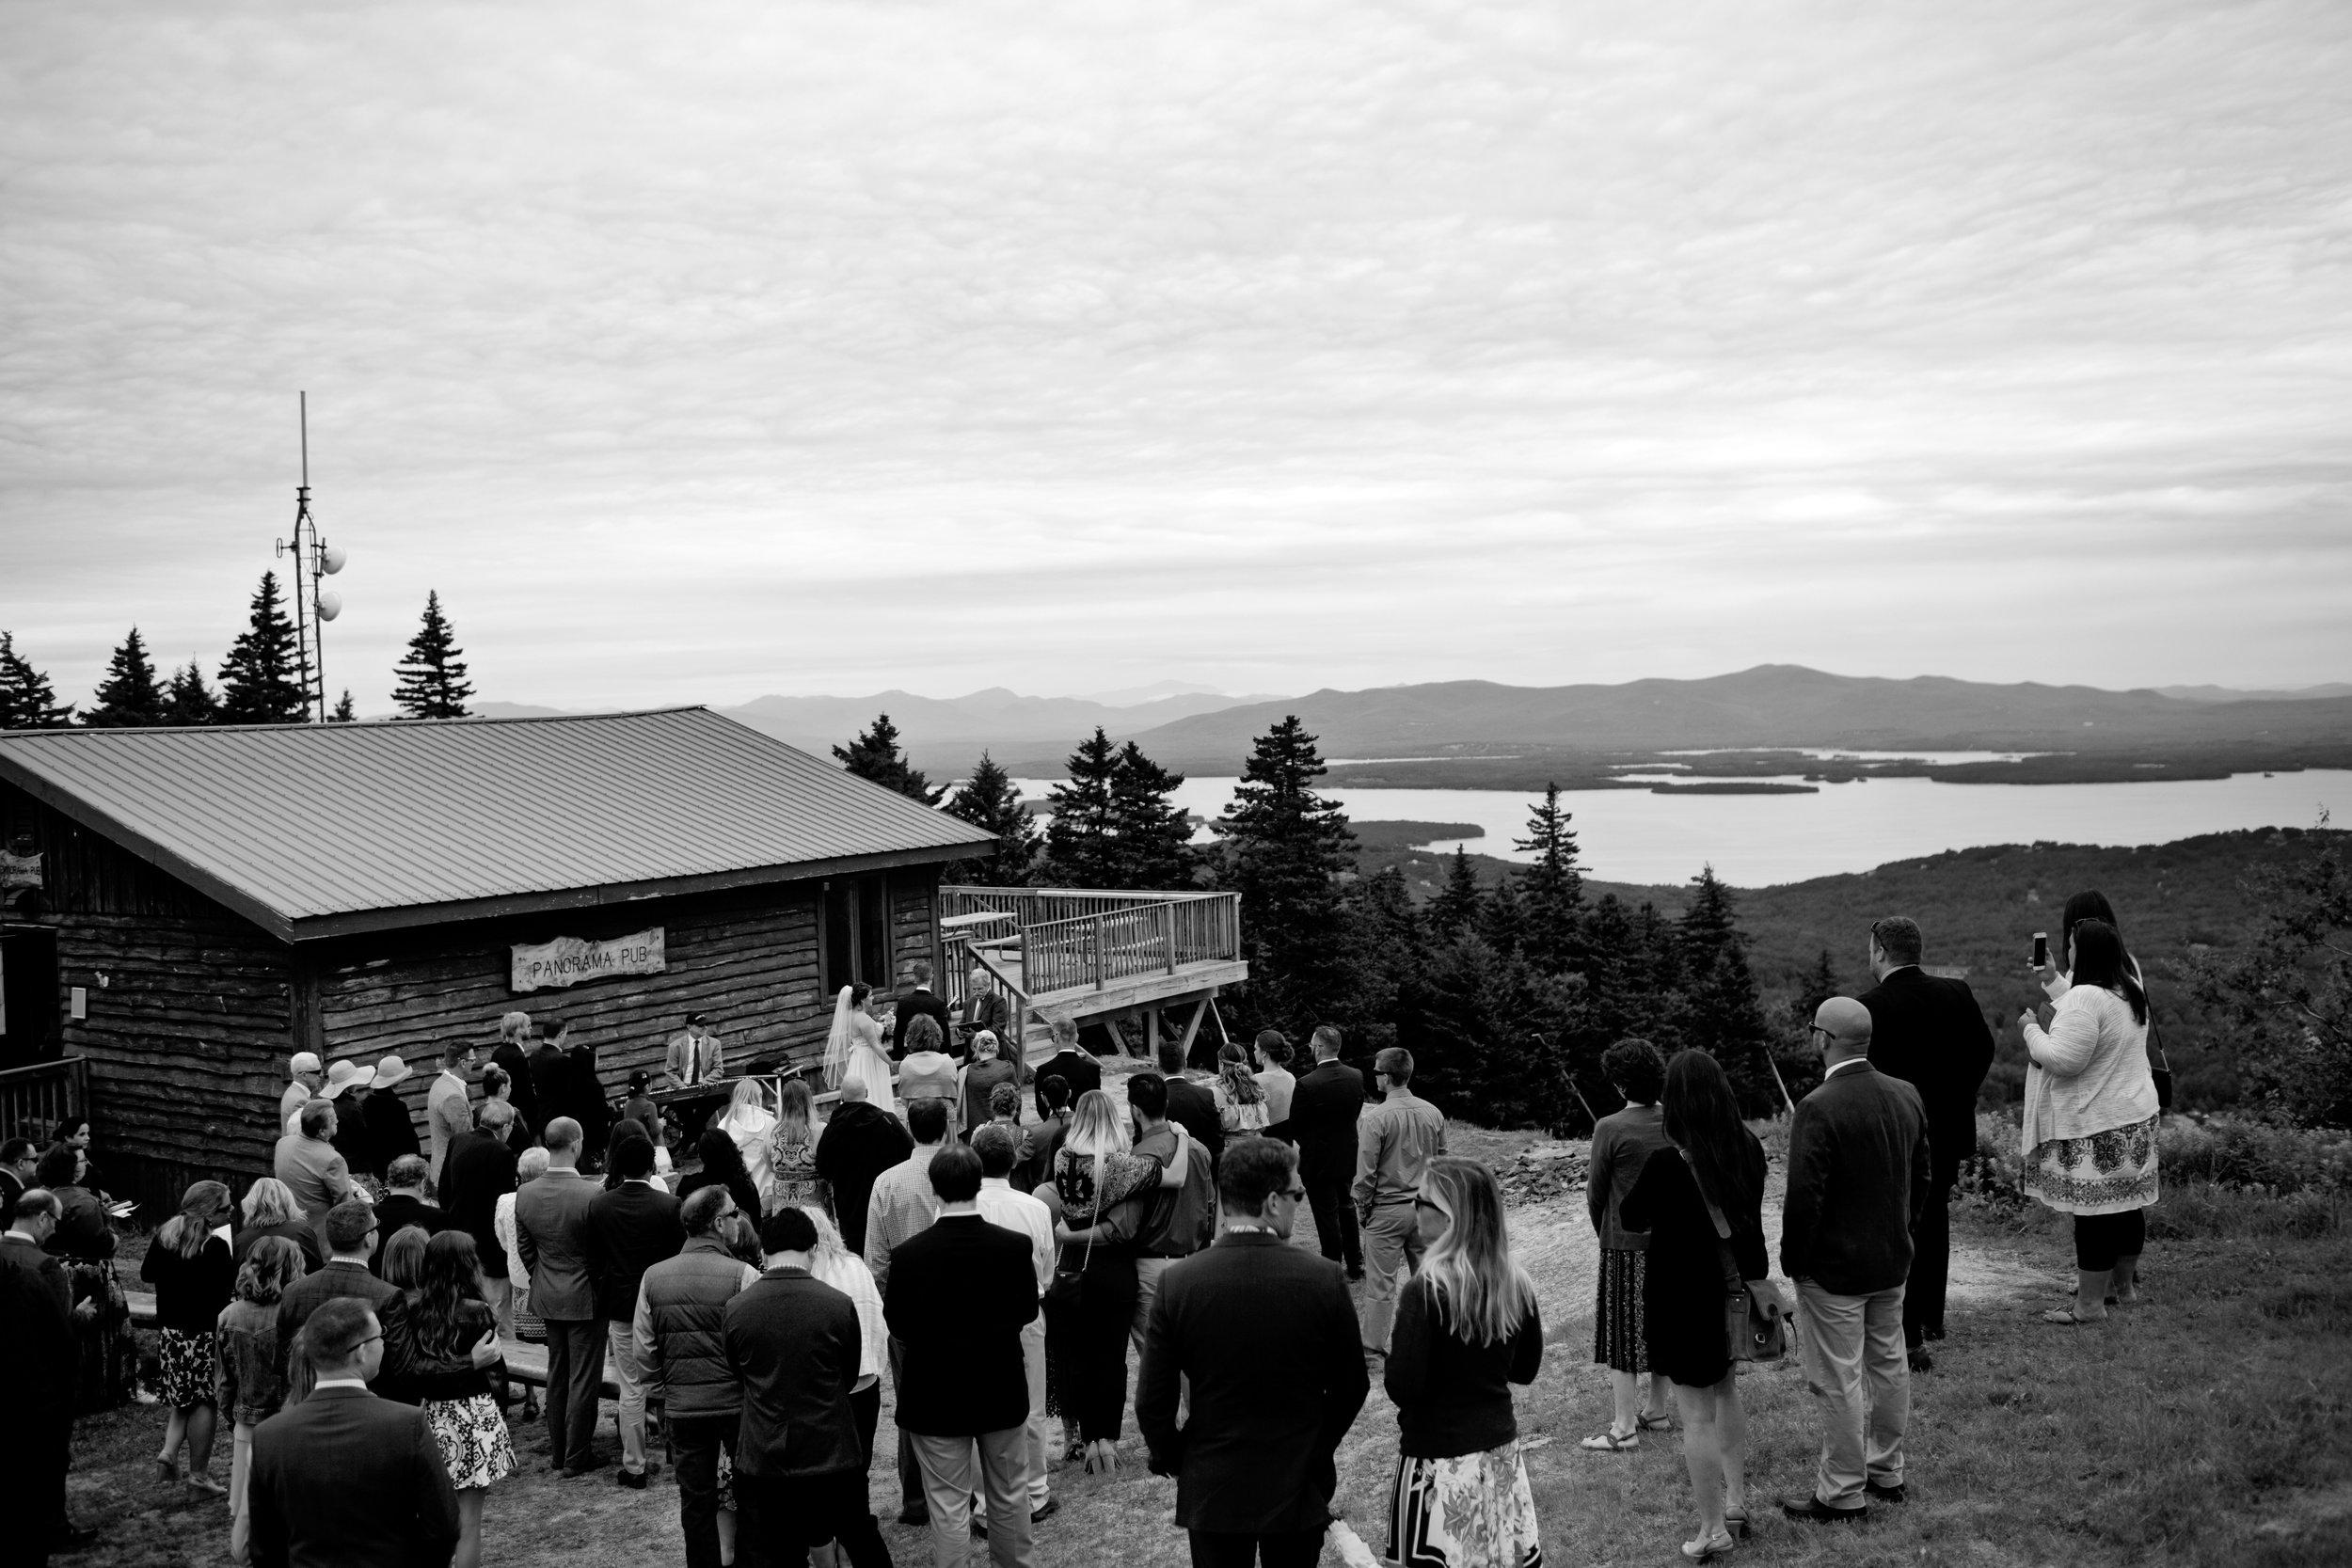 gunstock-mountain-resort-wedding-photos-13.JPG